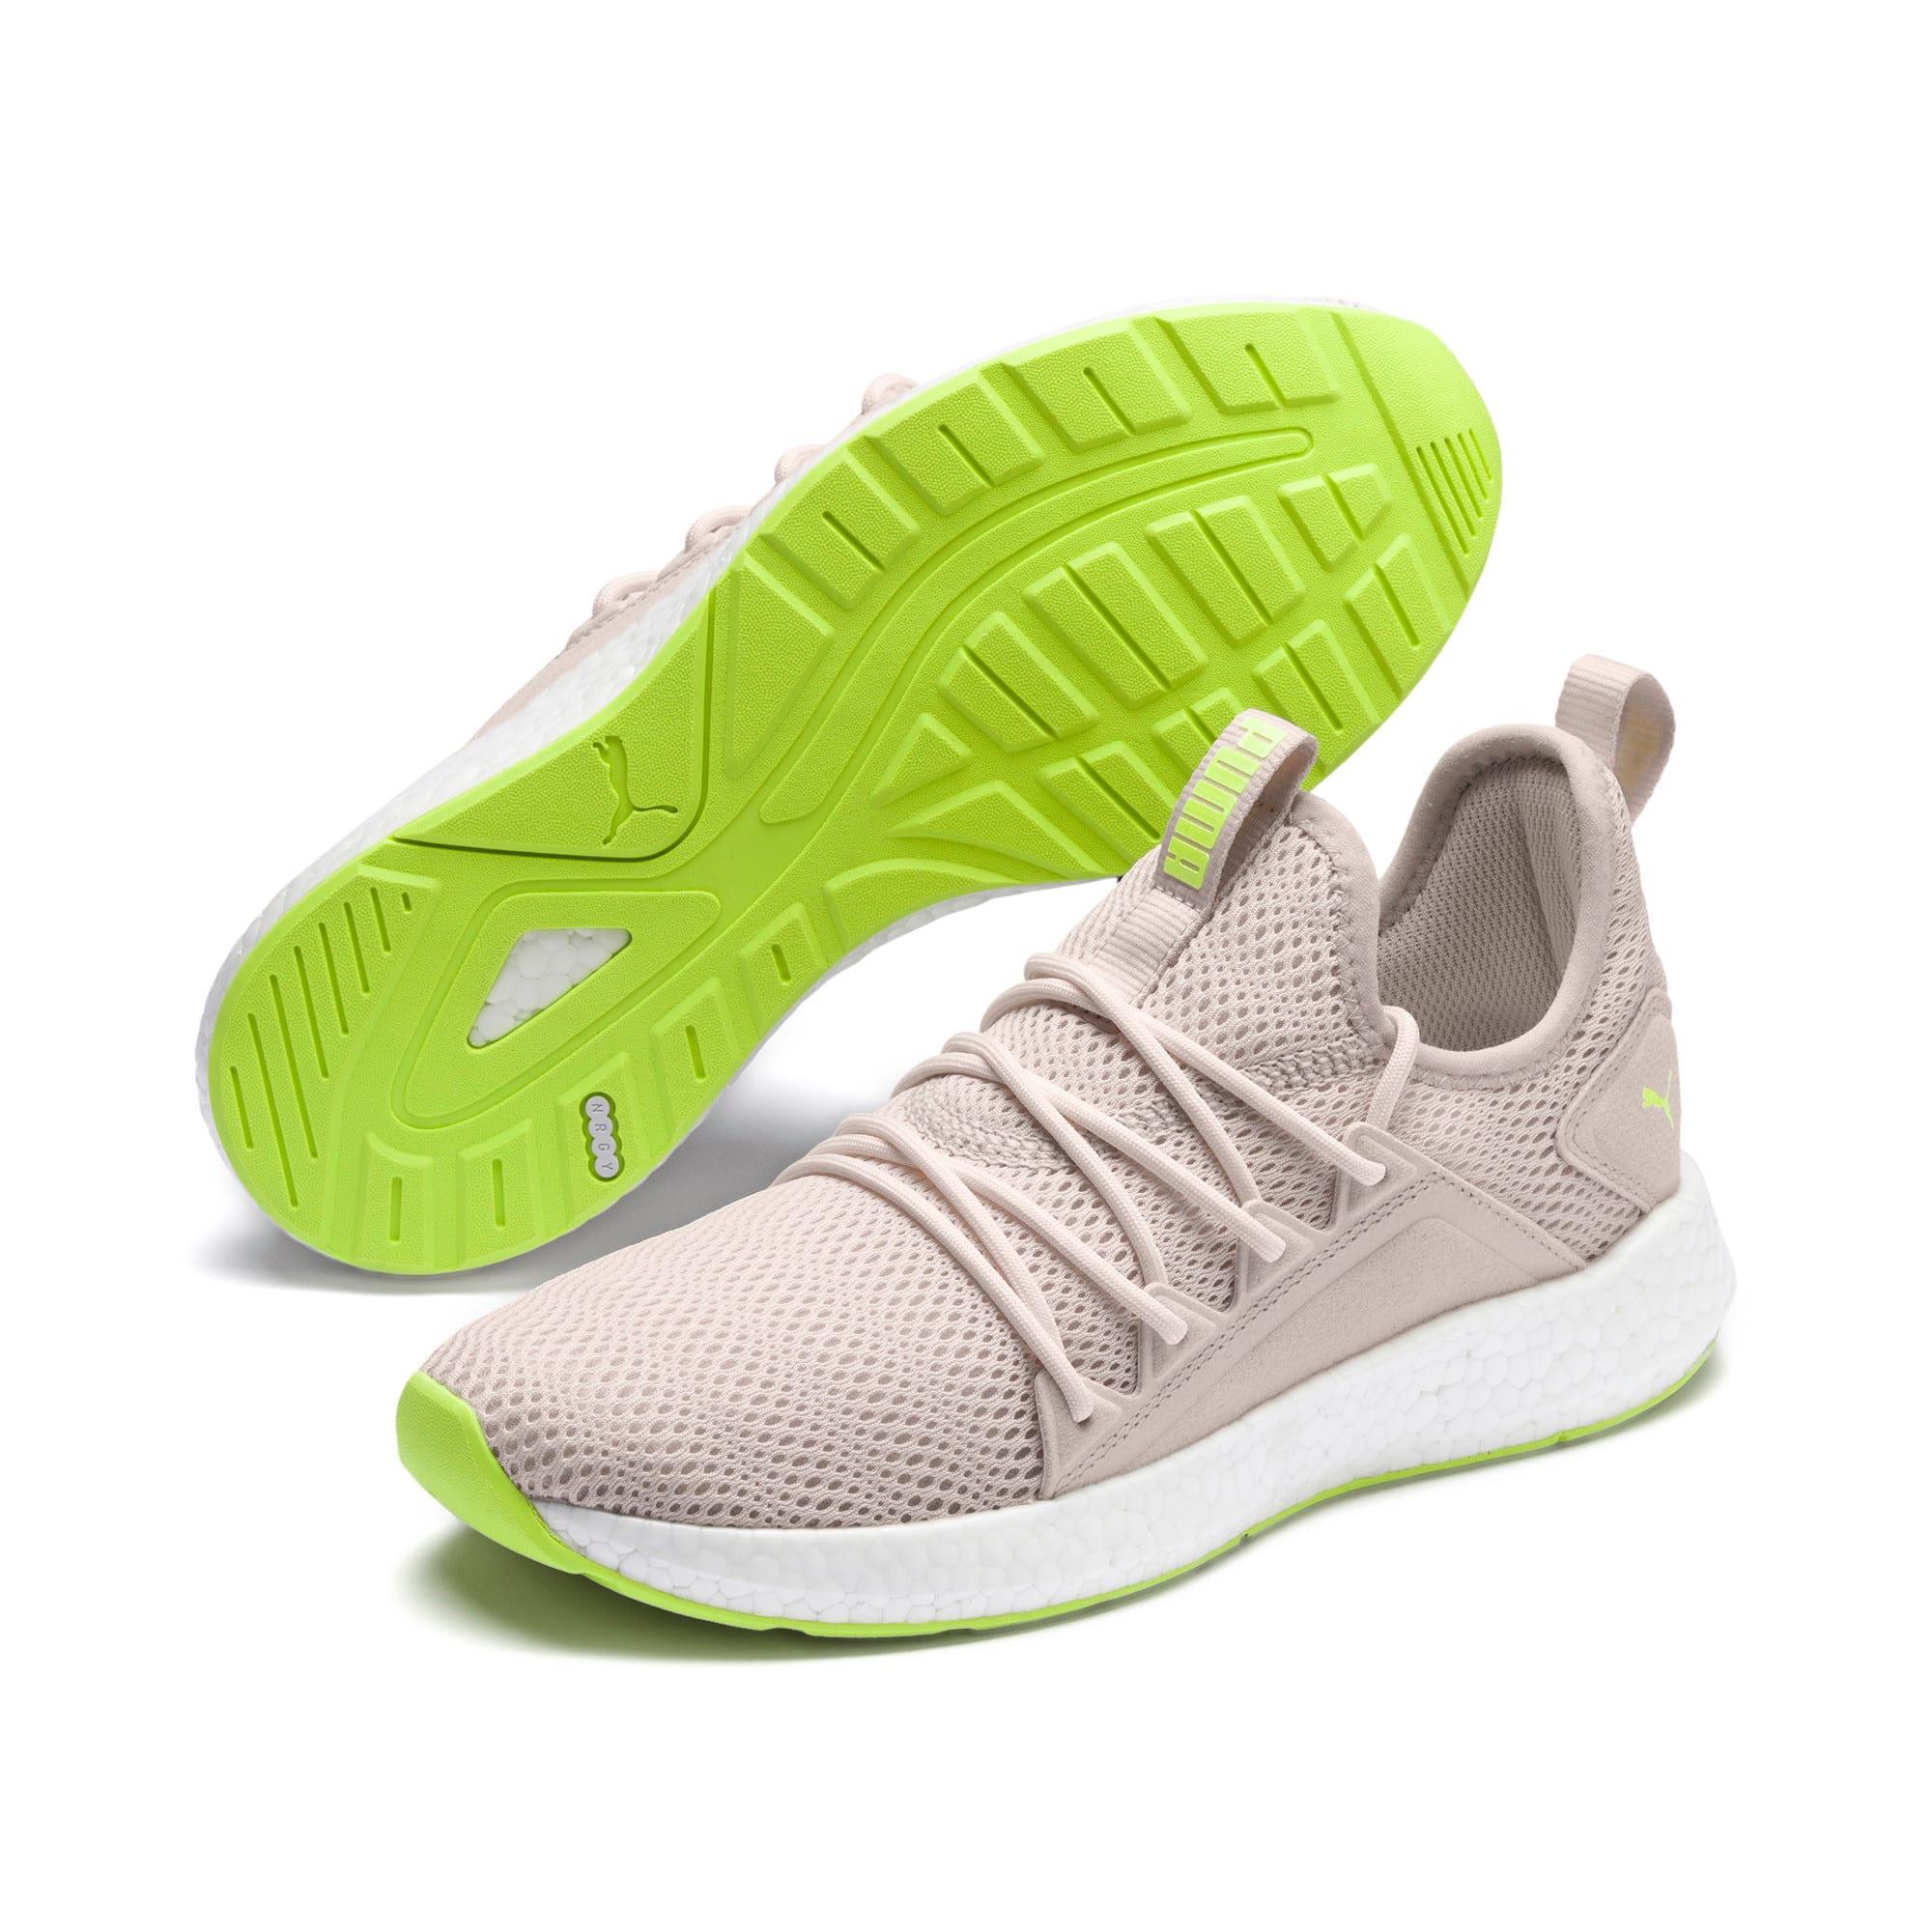 Thumbnail 3 of NRGY Neko Shift Women's Running Shoes, Pastel Parchment, medium